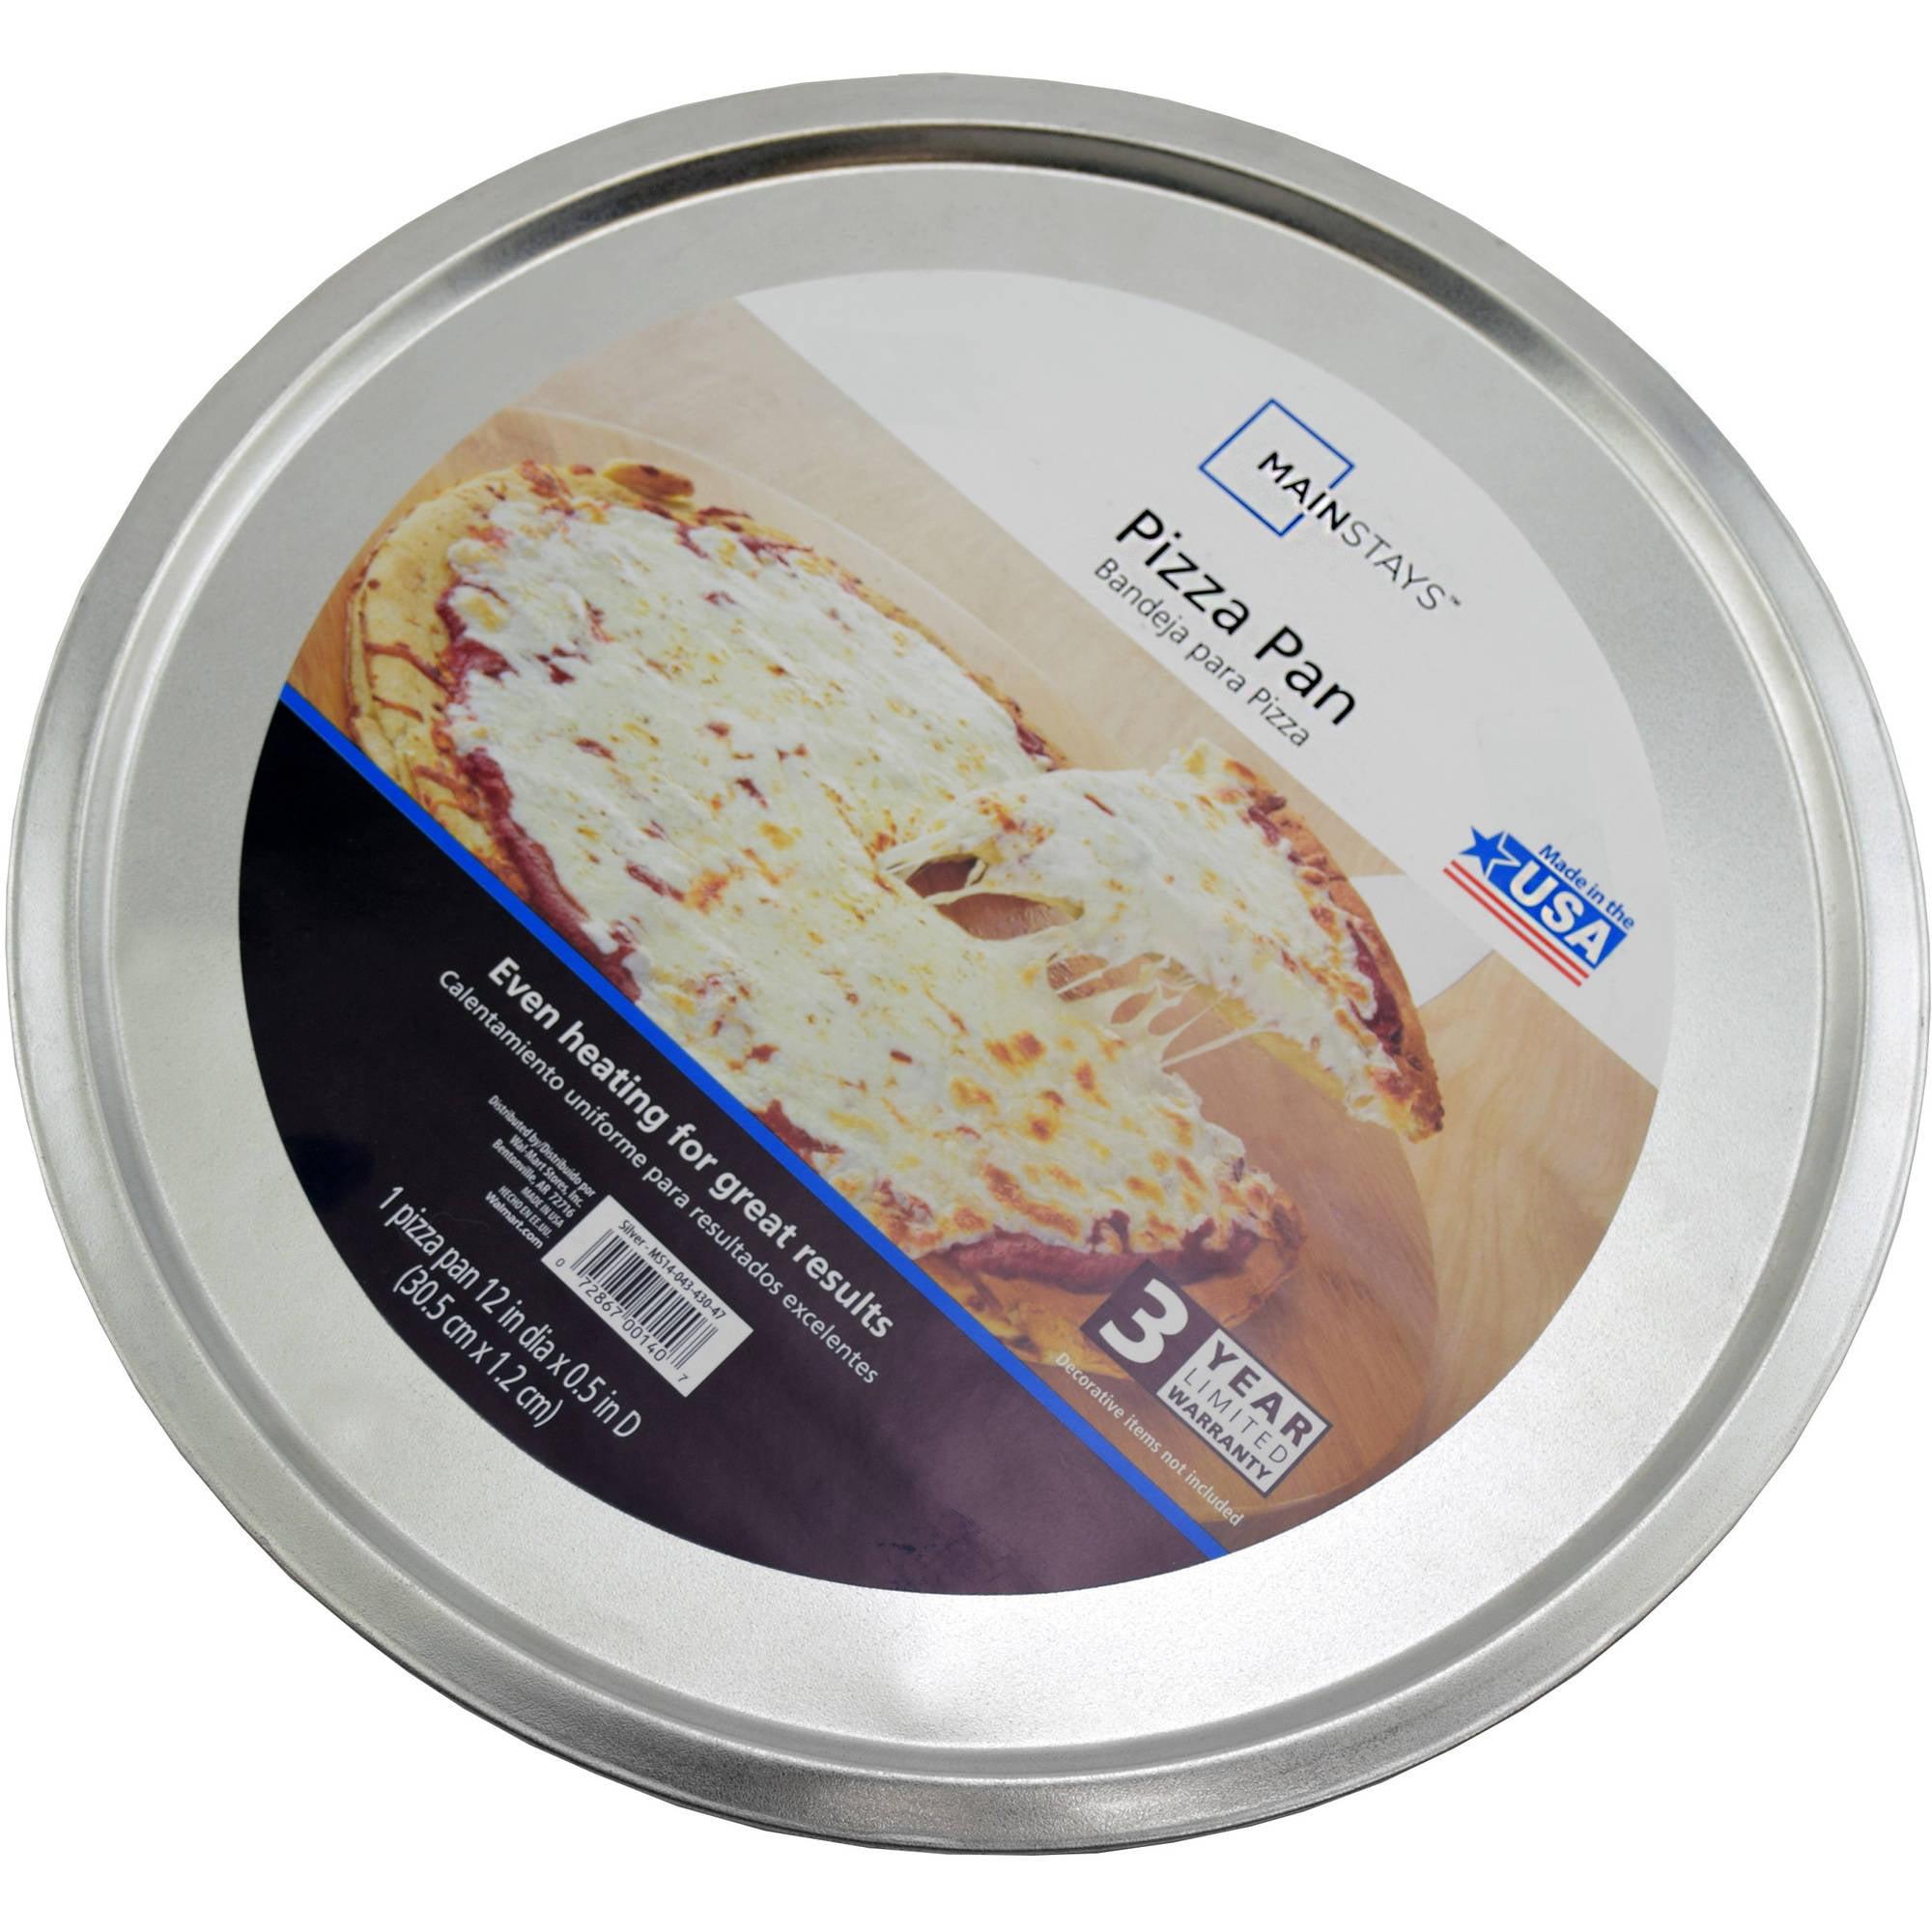 "Mainstays 12"" Pizza Pan"